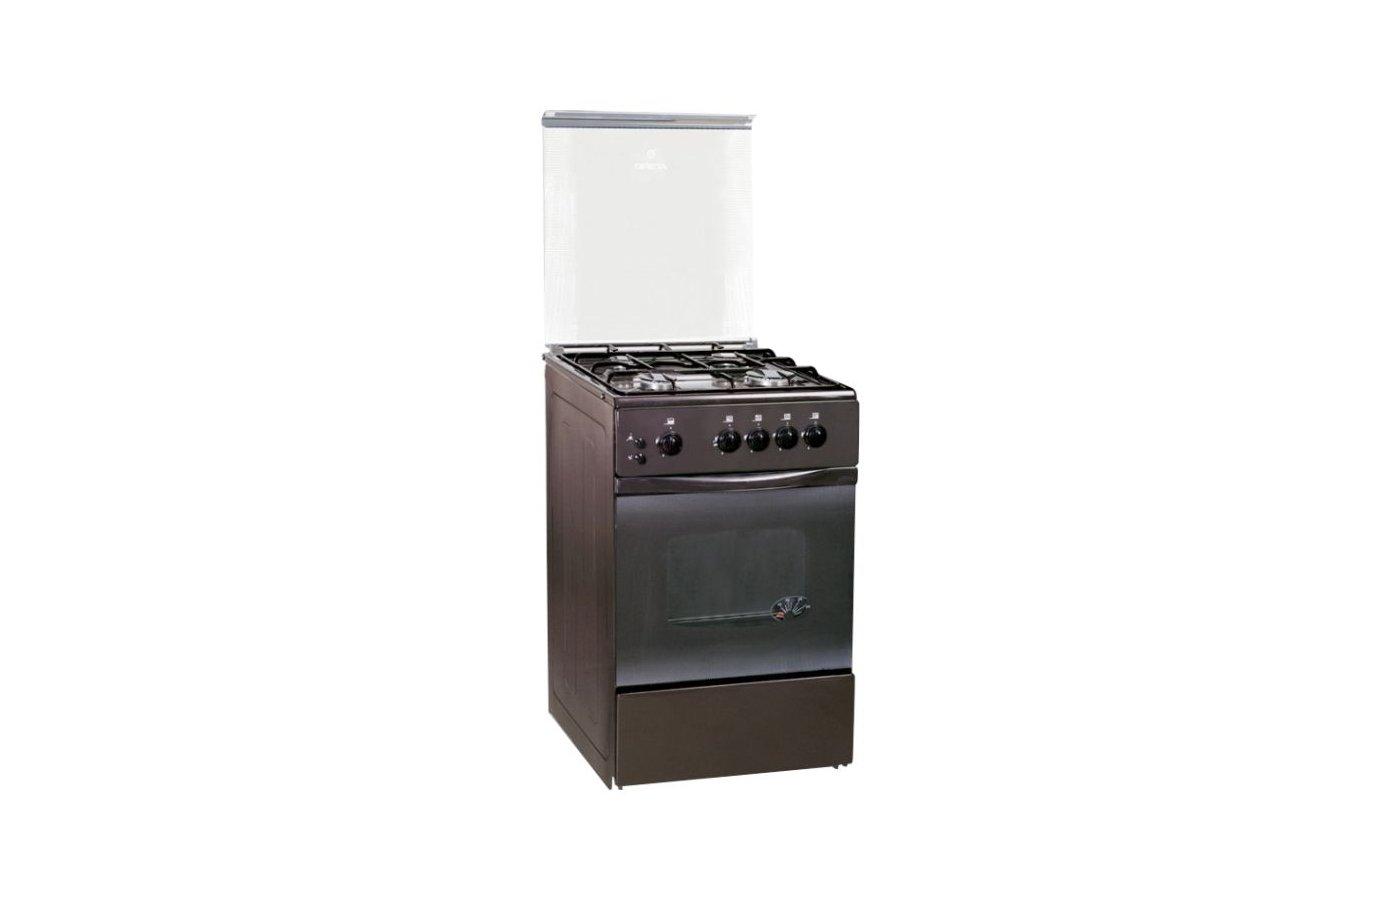 Плита газовая GRETA 1470-00 исп. 07 BR